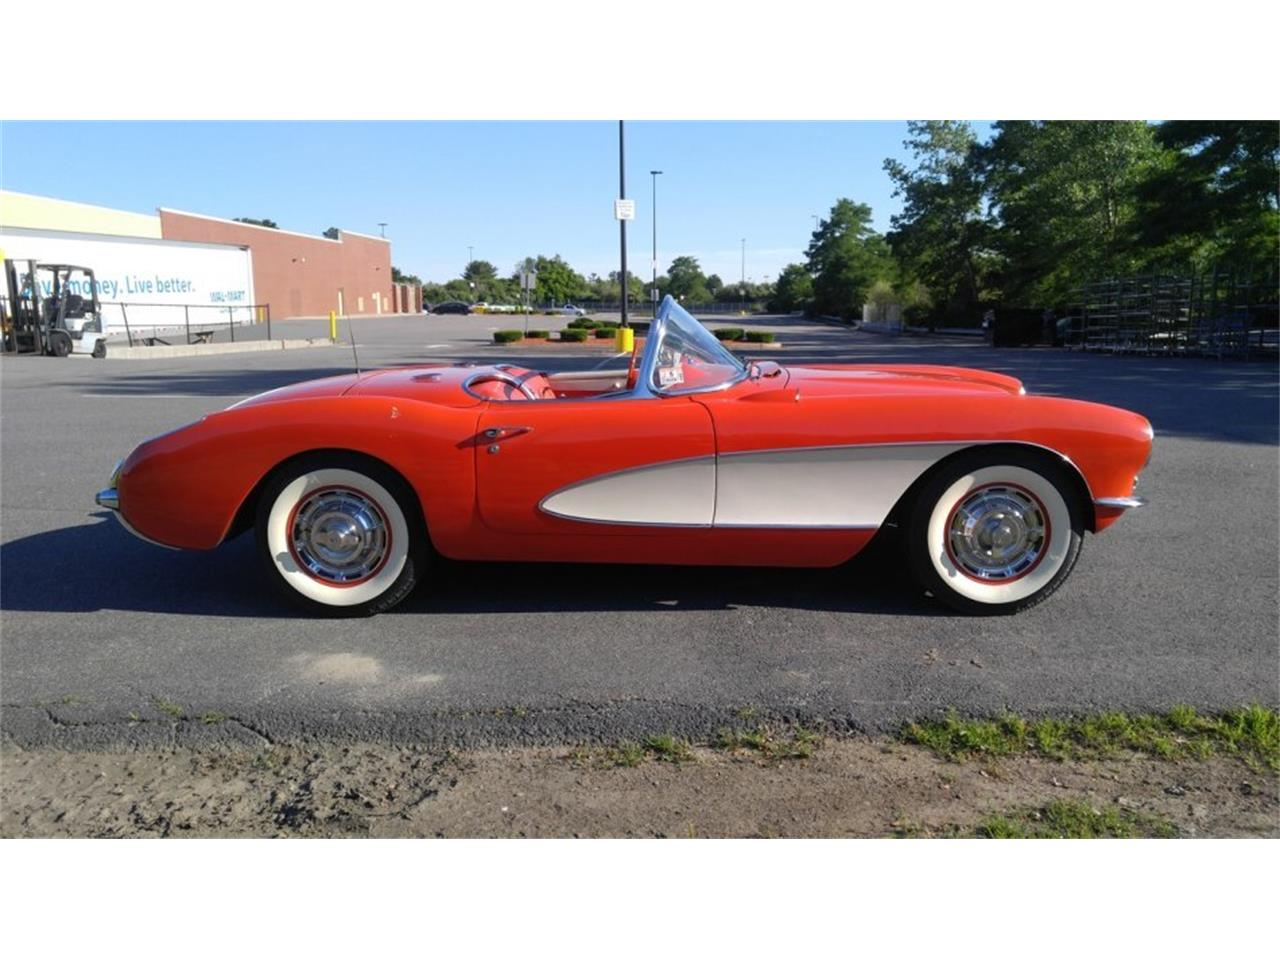 Large Picture of Classic 1956 Corvette located in Hanover Massachusetts - $59,500.00 - K3QK